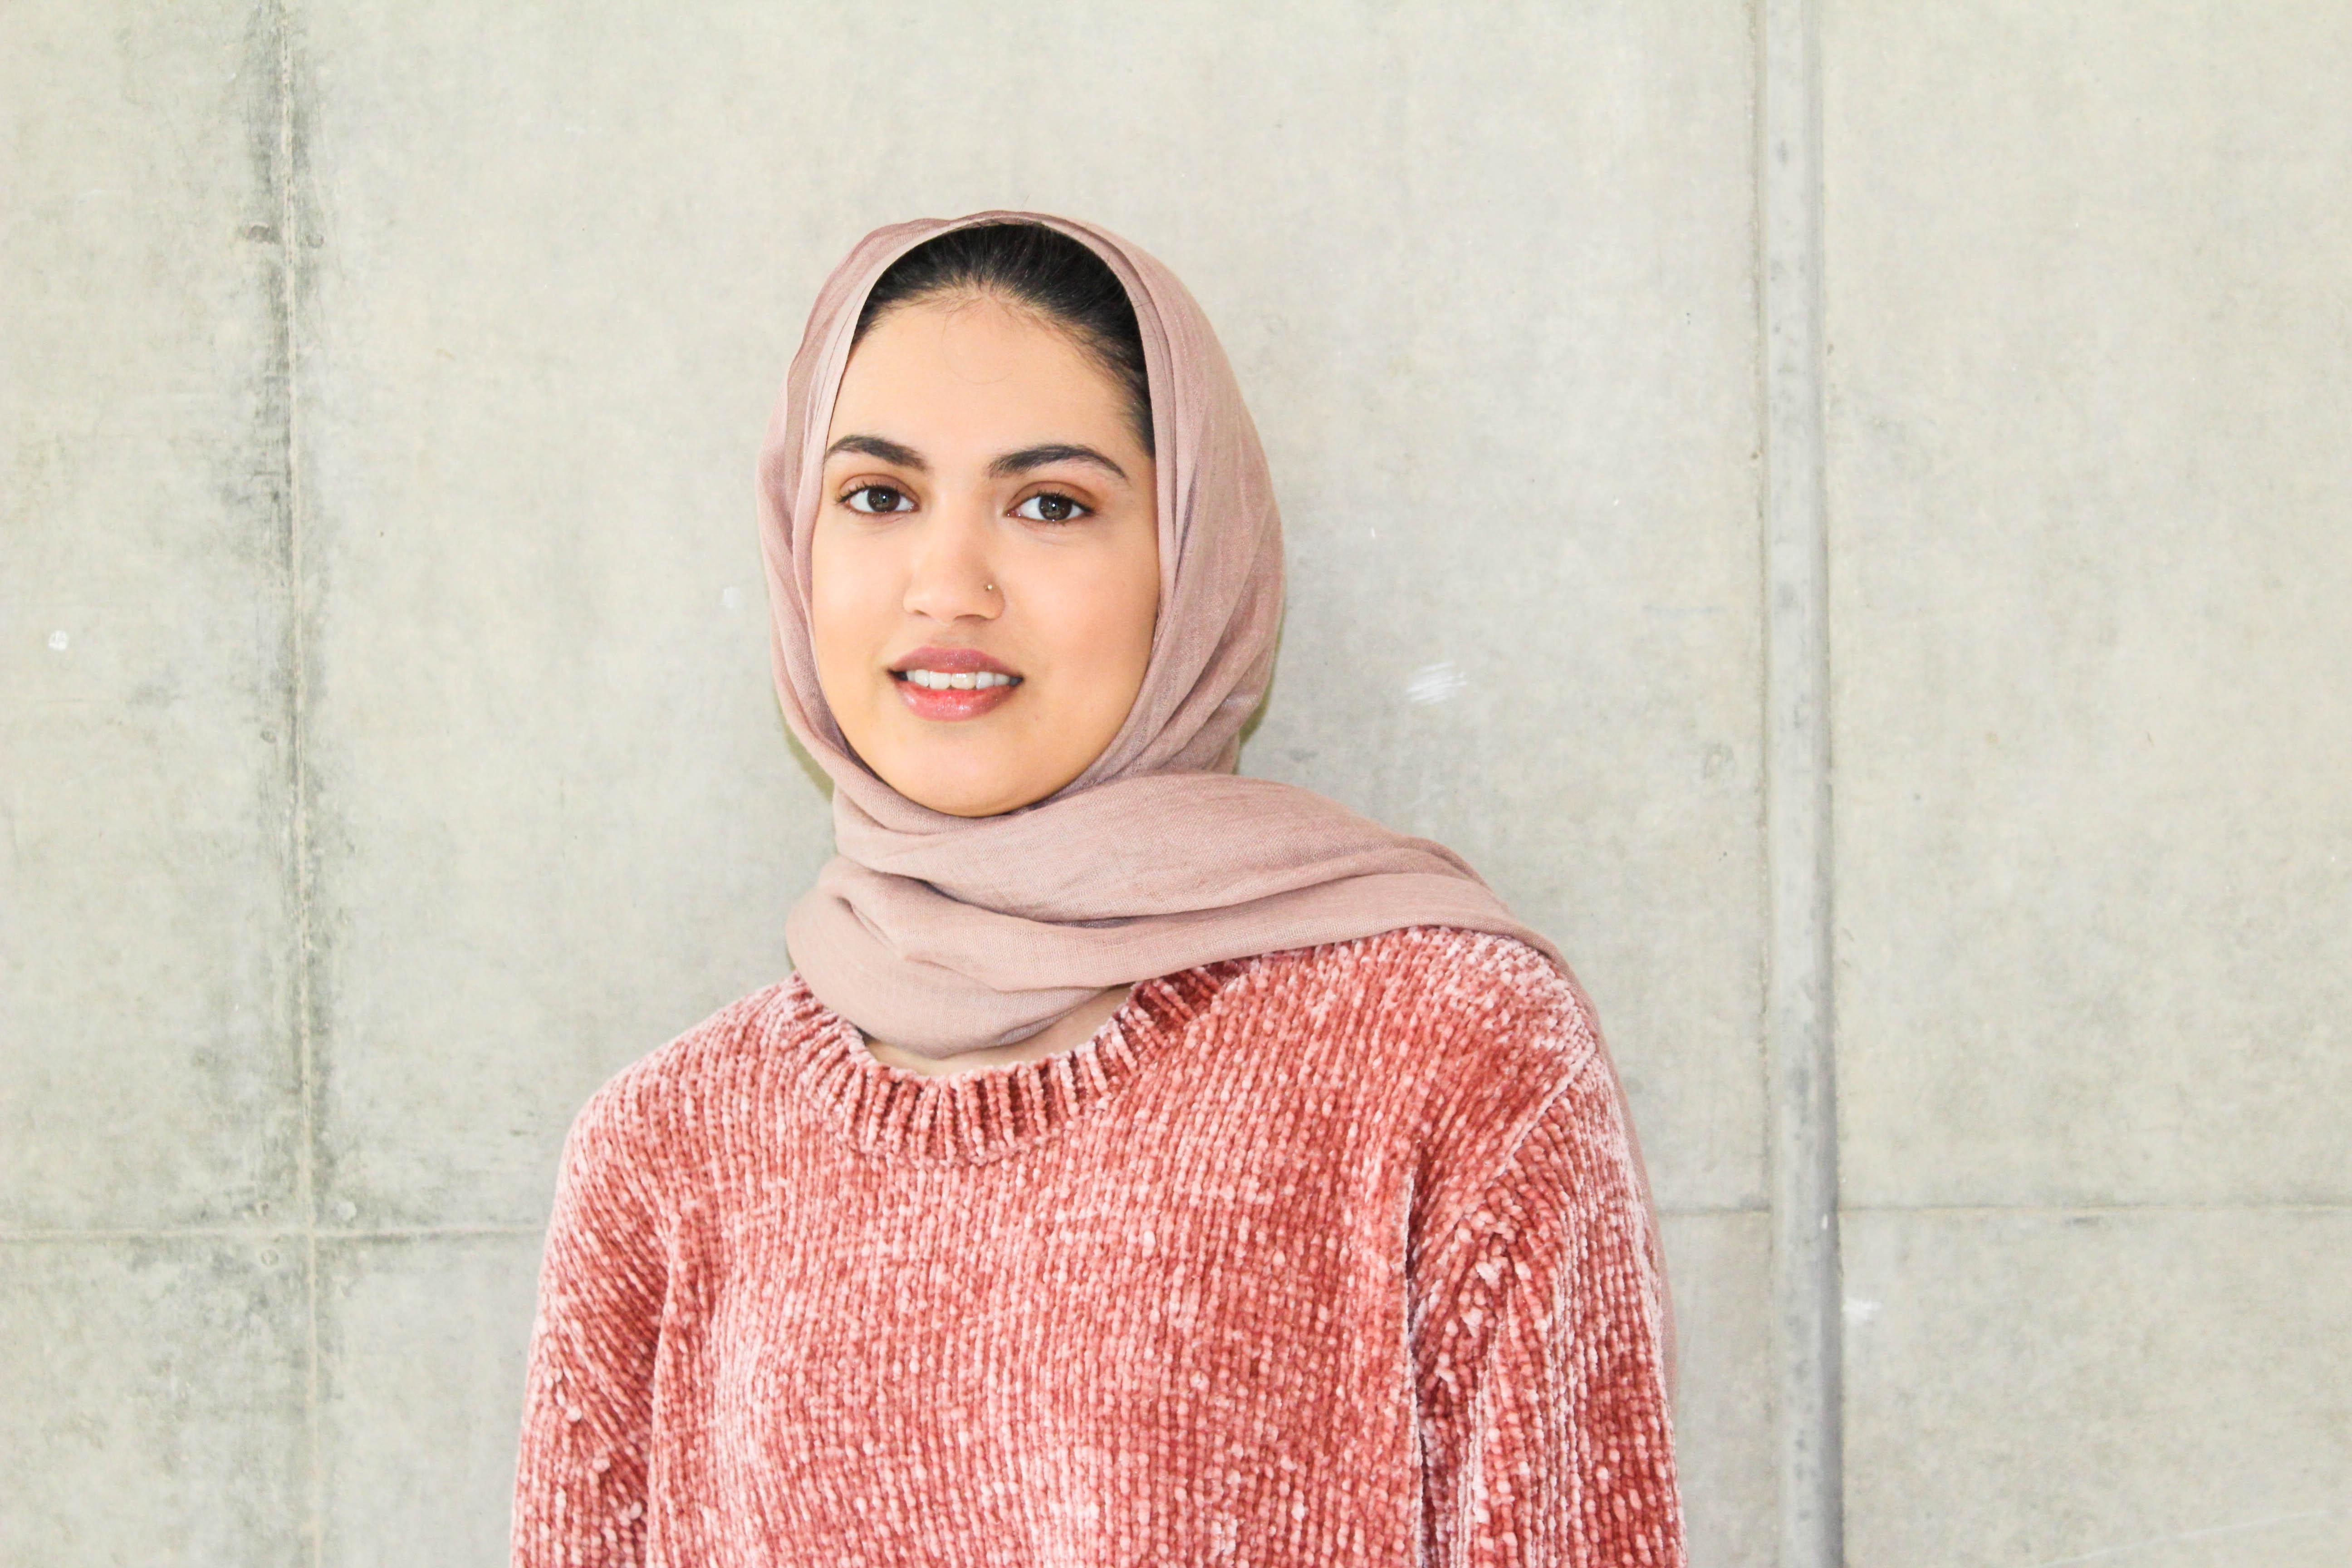 Image: Portrait photograph of Biomedical Science student Farah Saddique